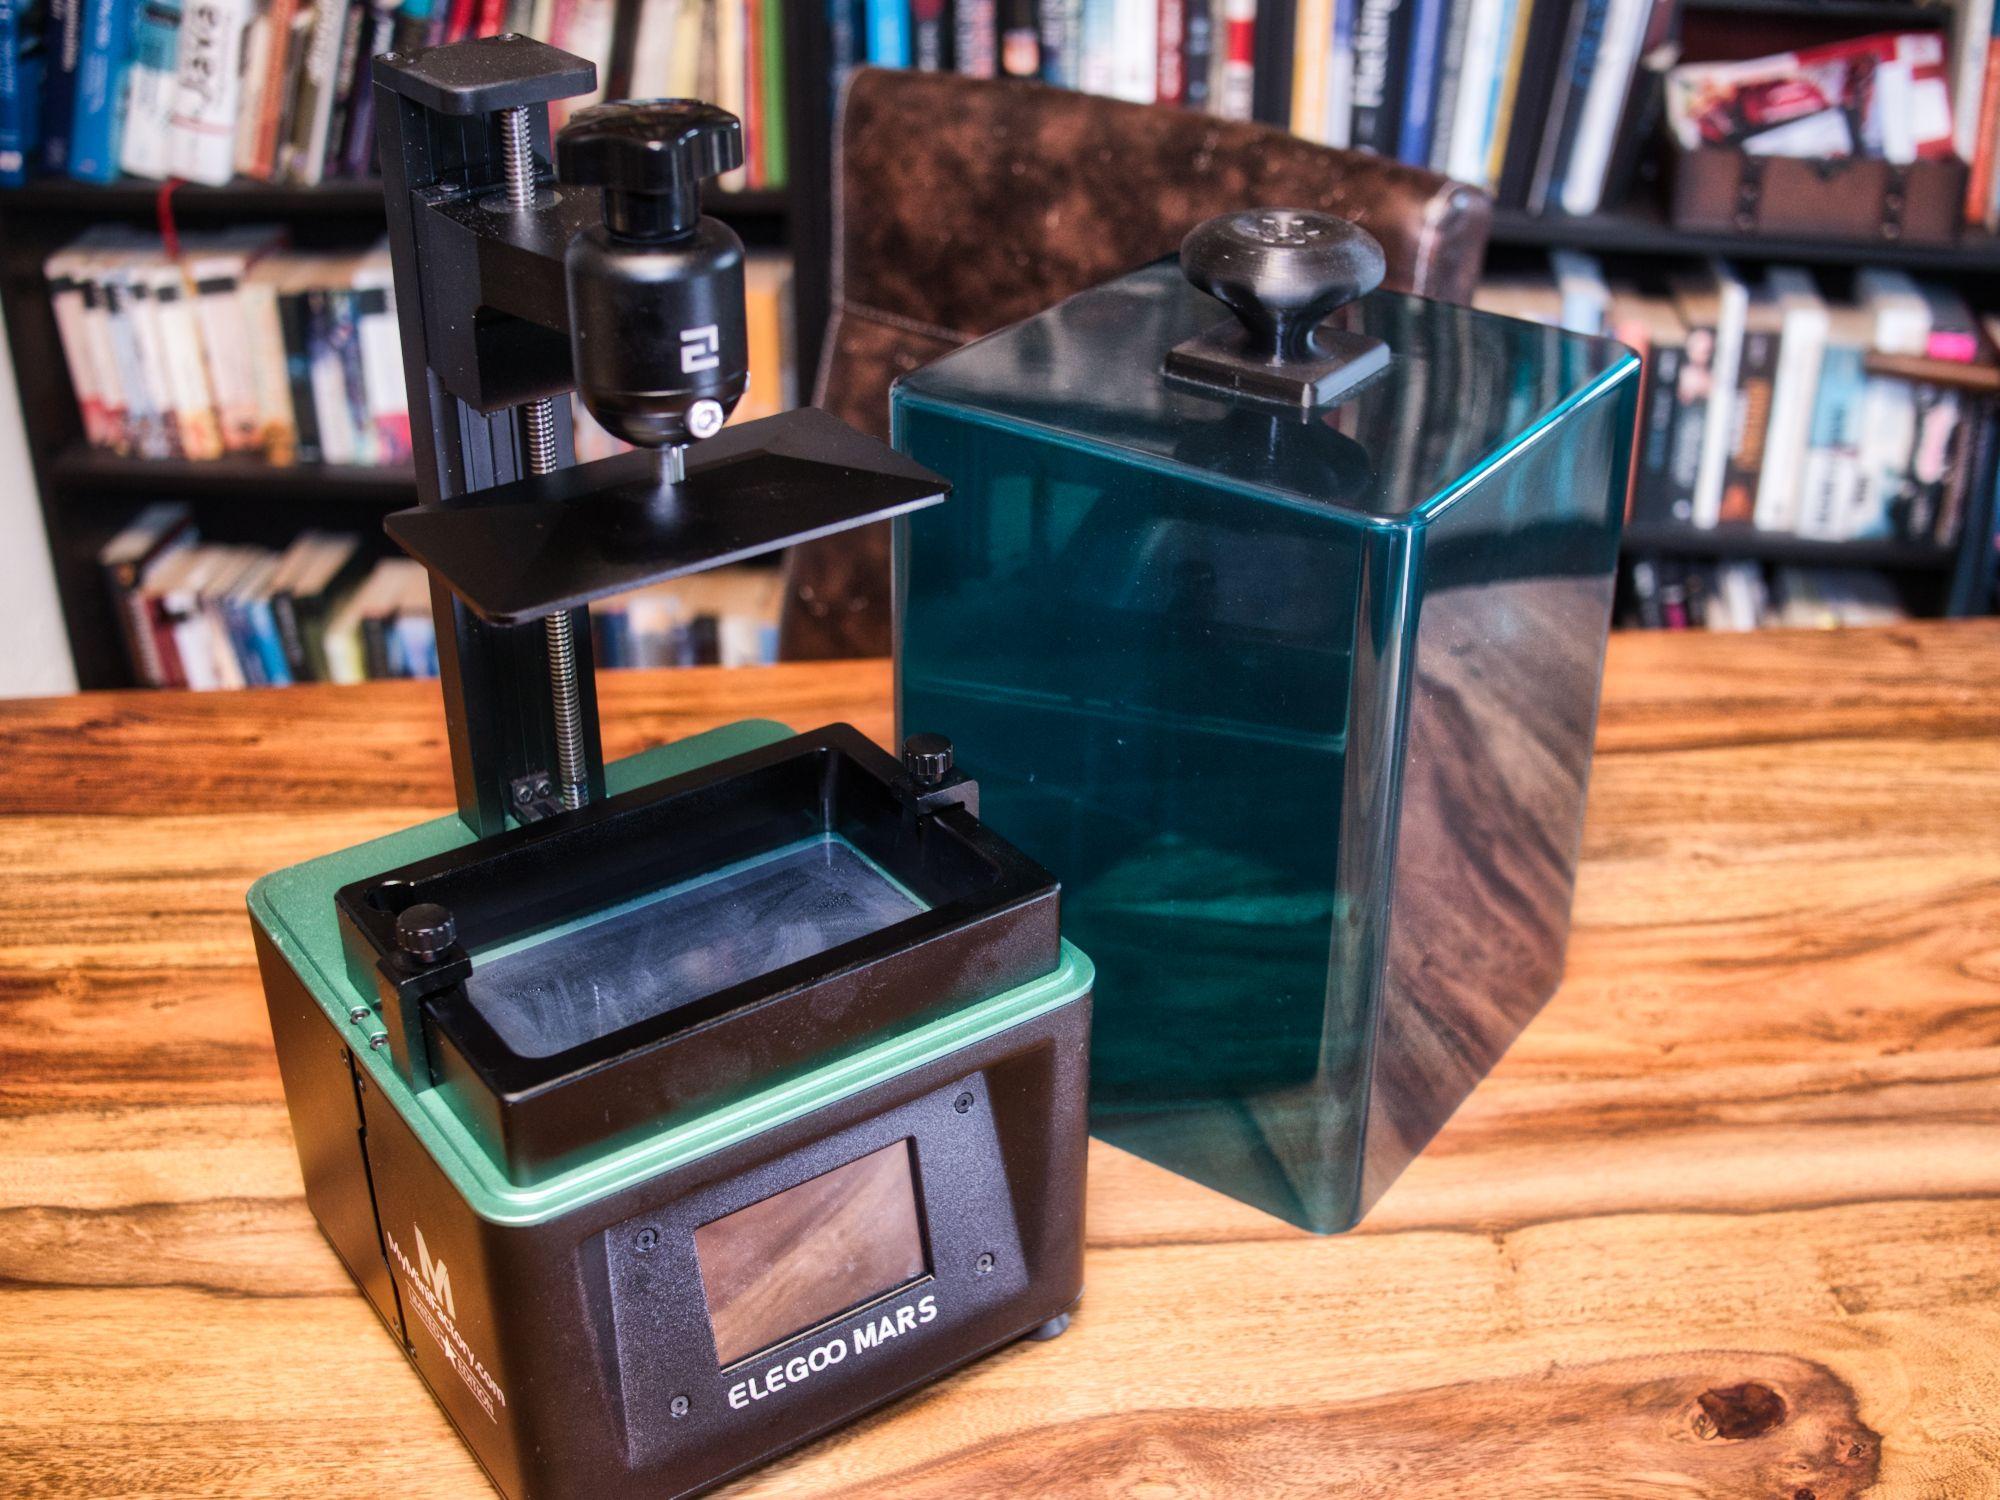 Elegoo Mars 3d printer